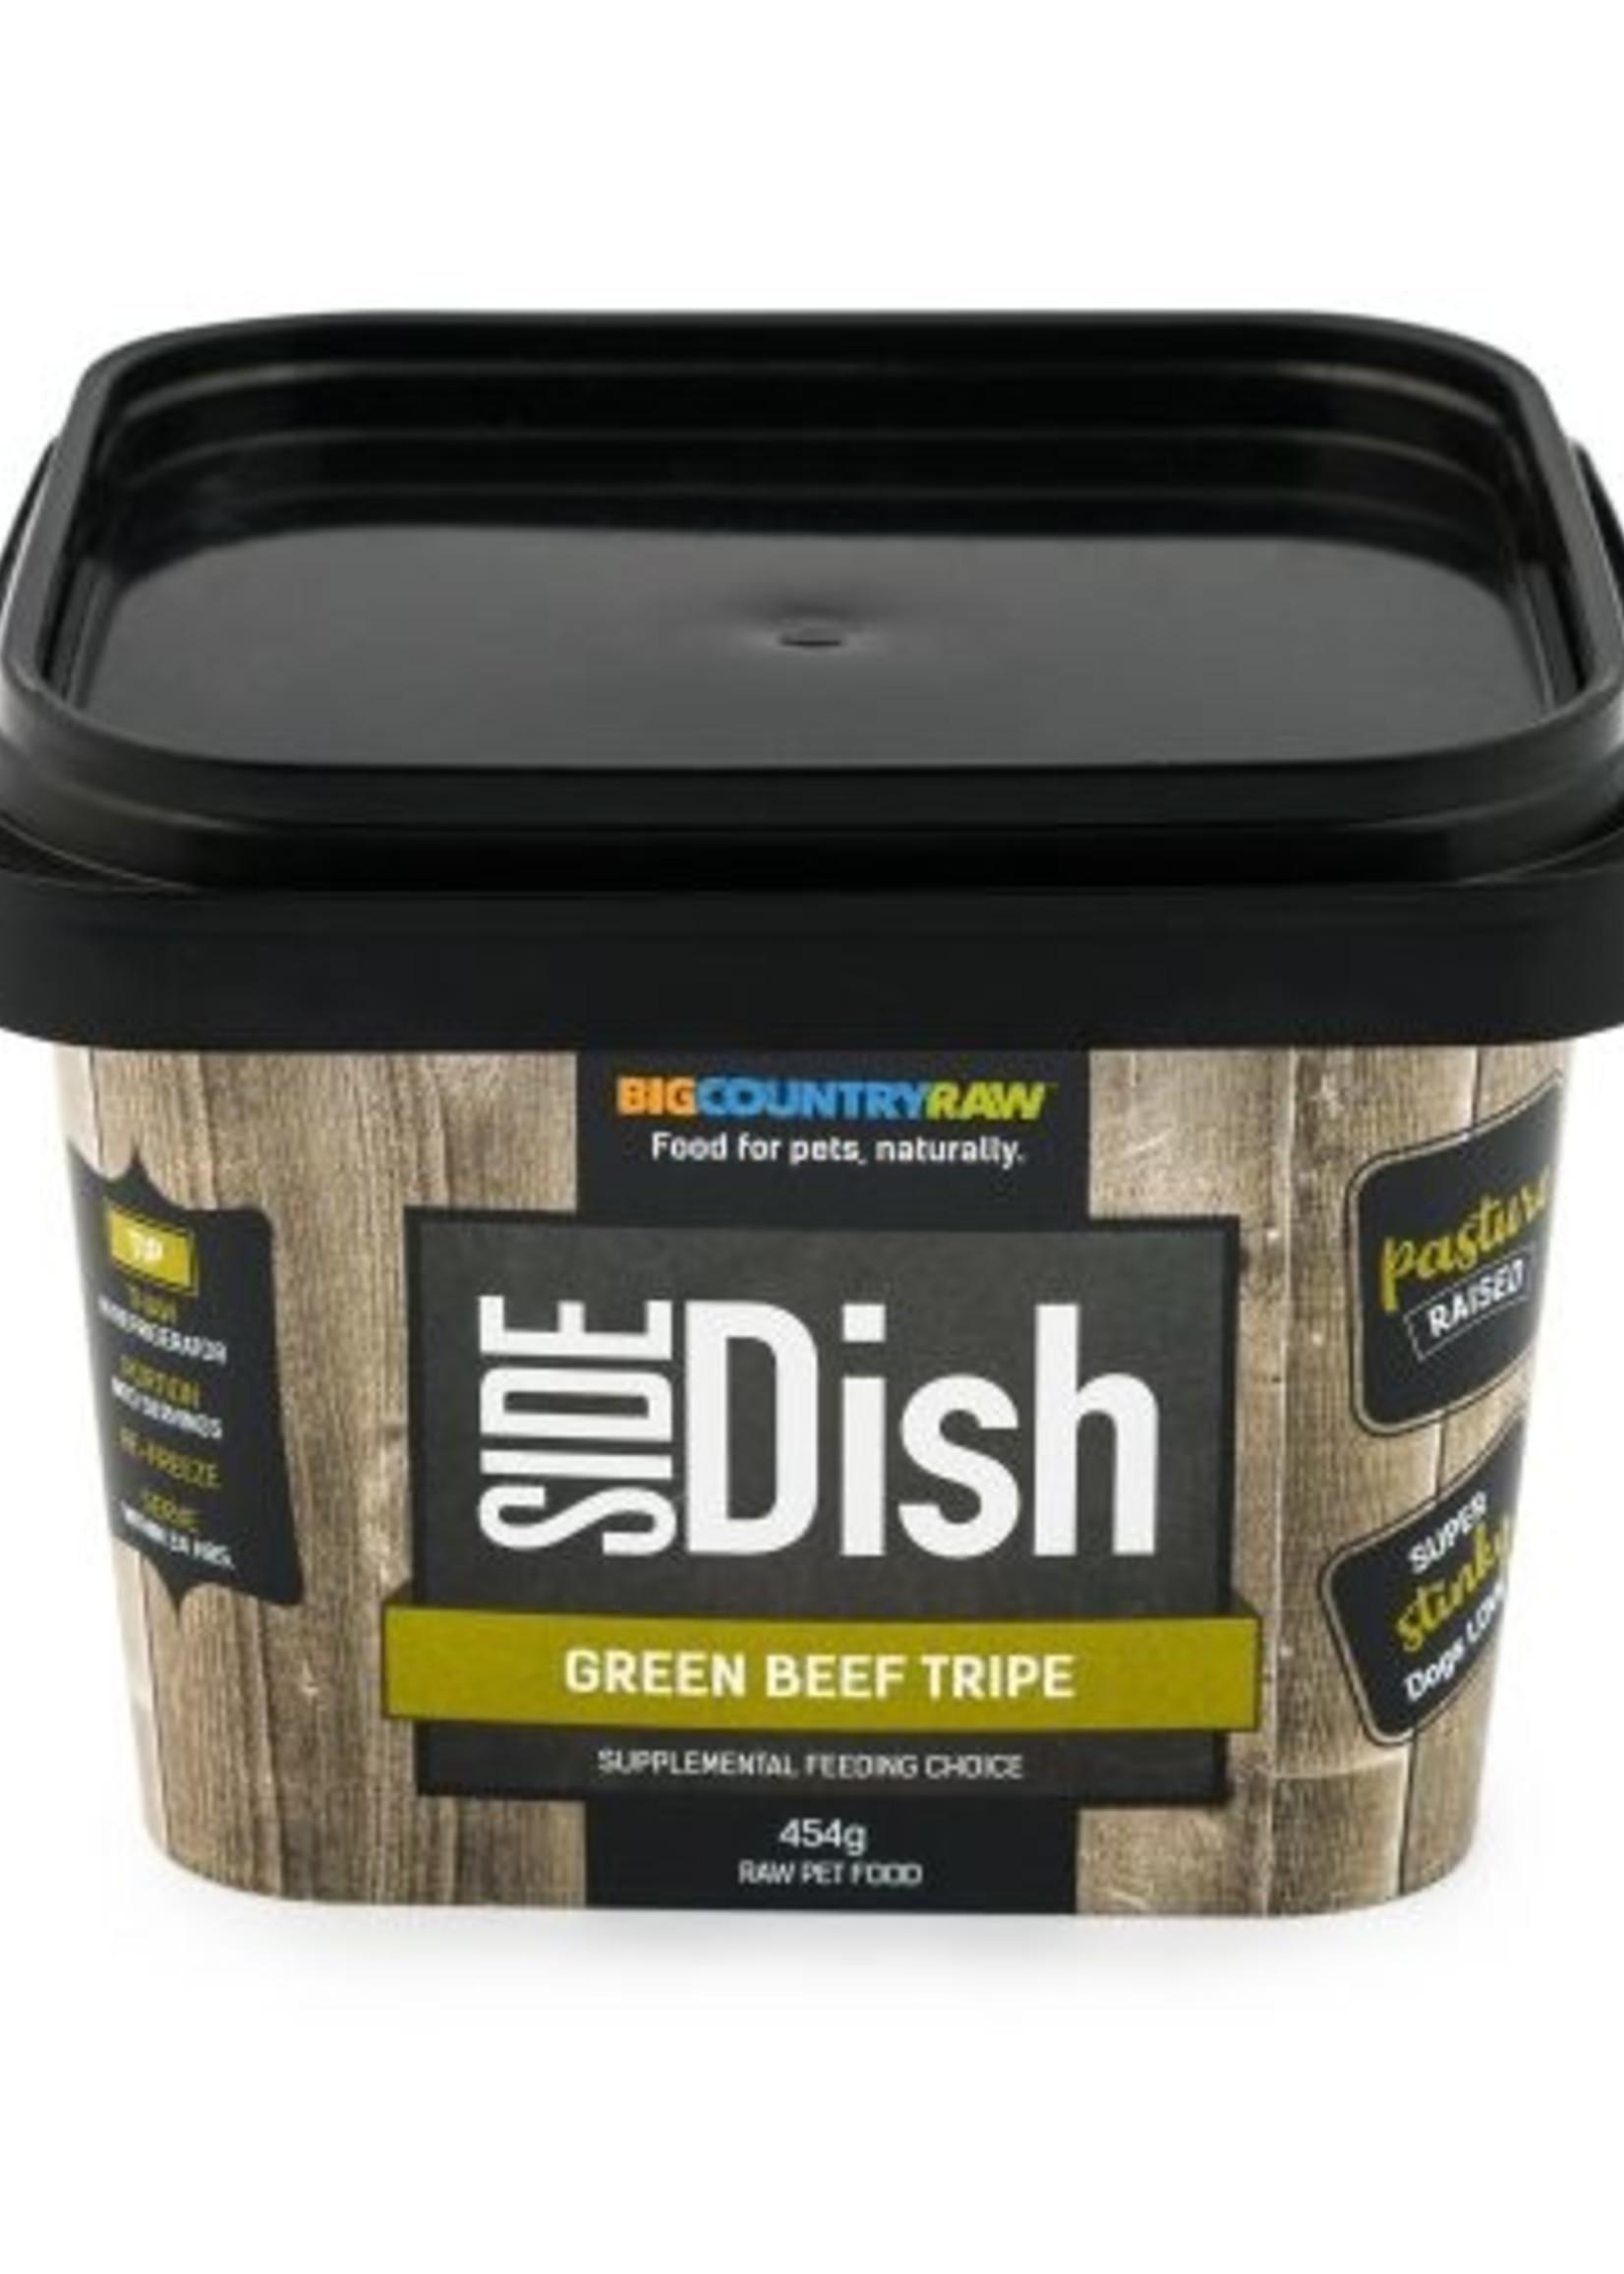 Big Country Raw Big Country Raw Side Dish Green Beef Tripe 1lb